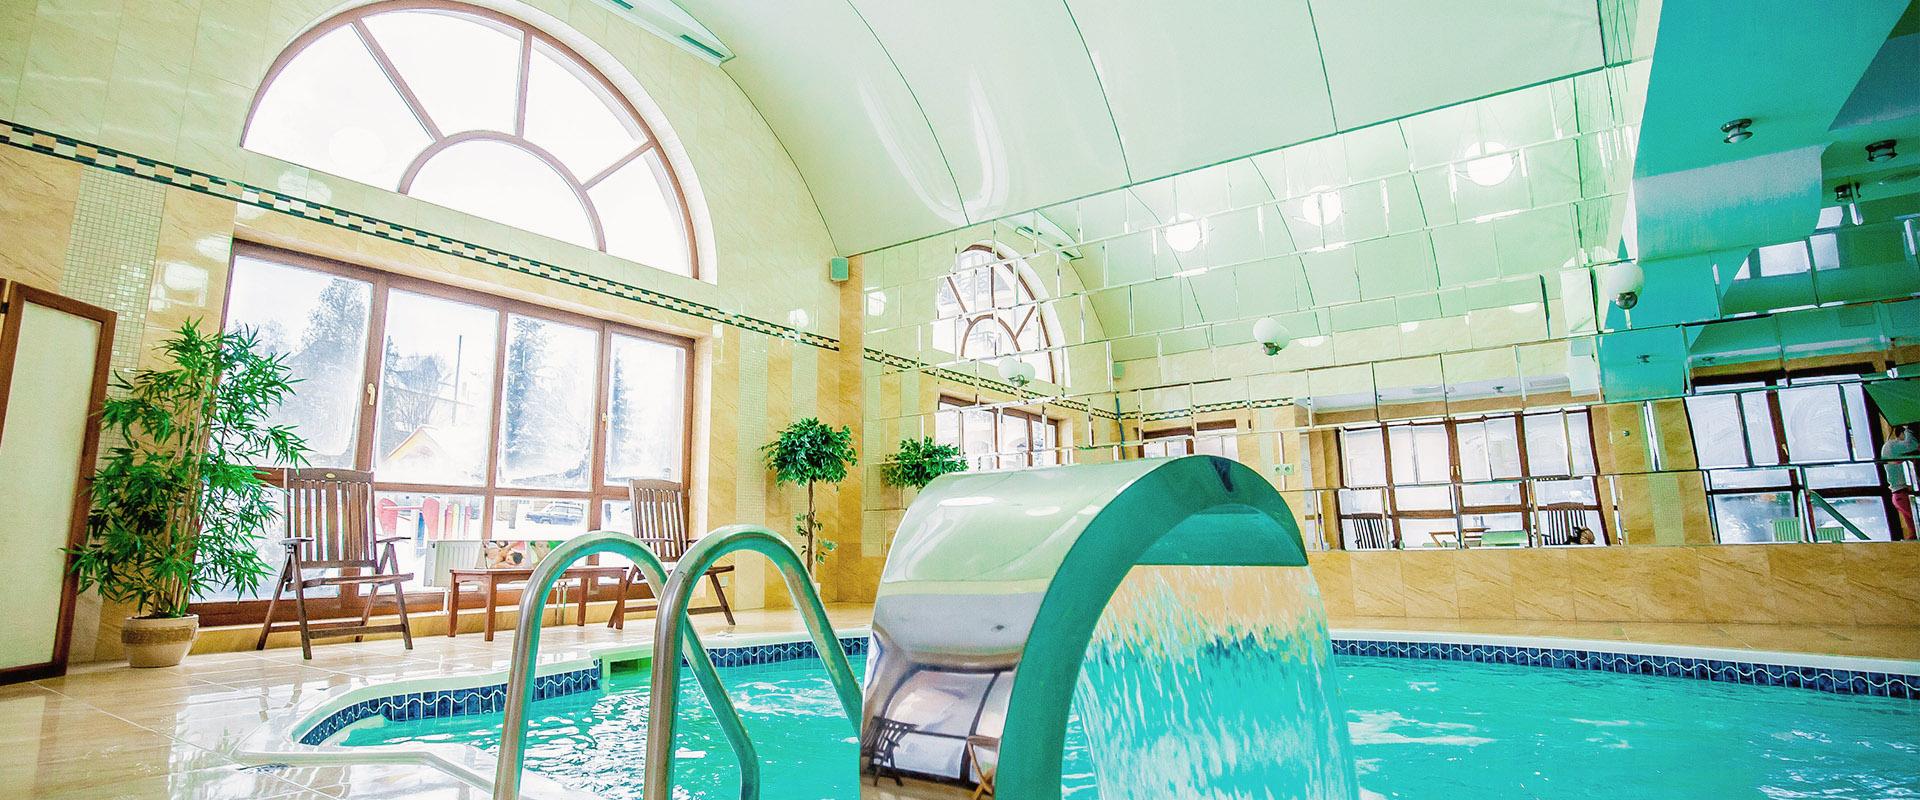 Нічний басейн спа-готель Respect